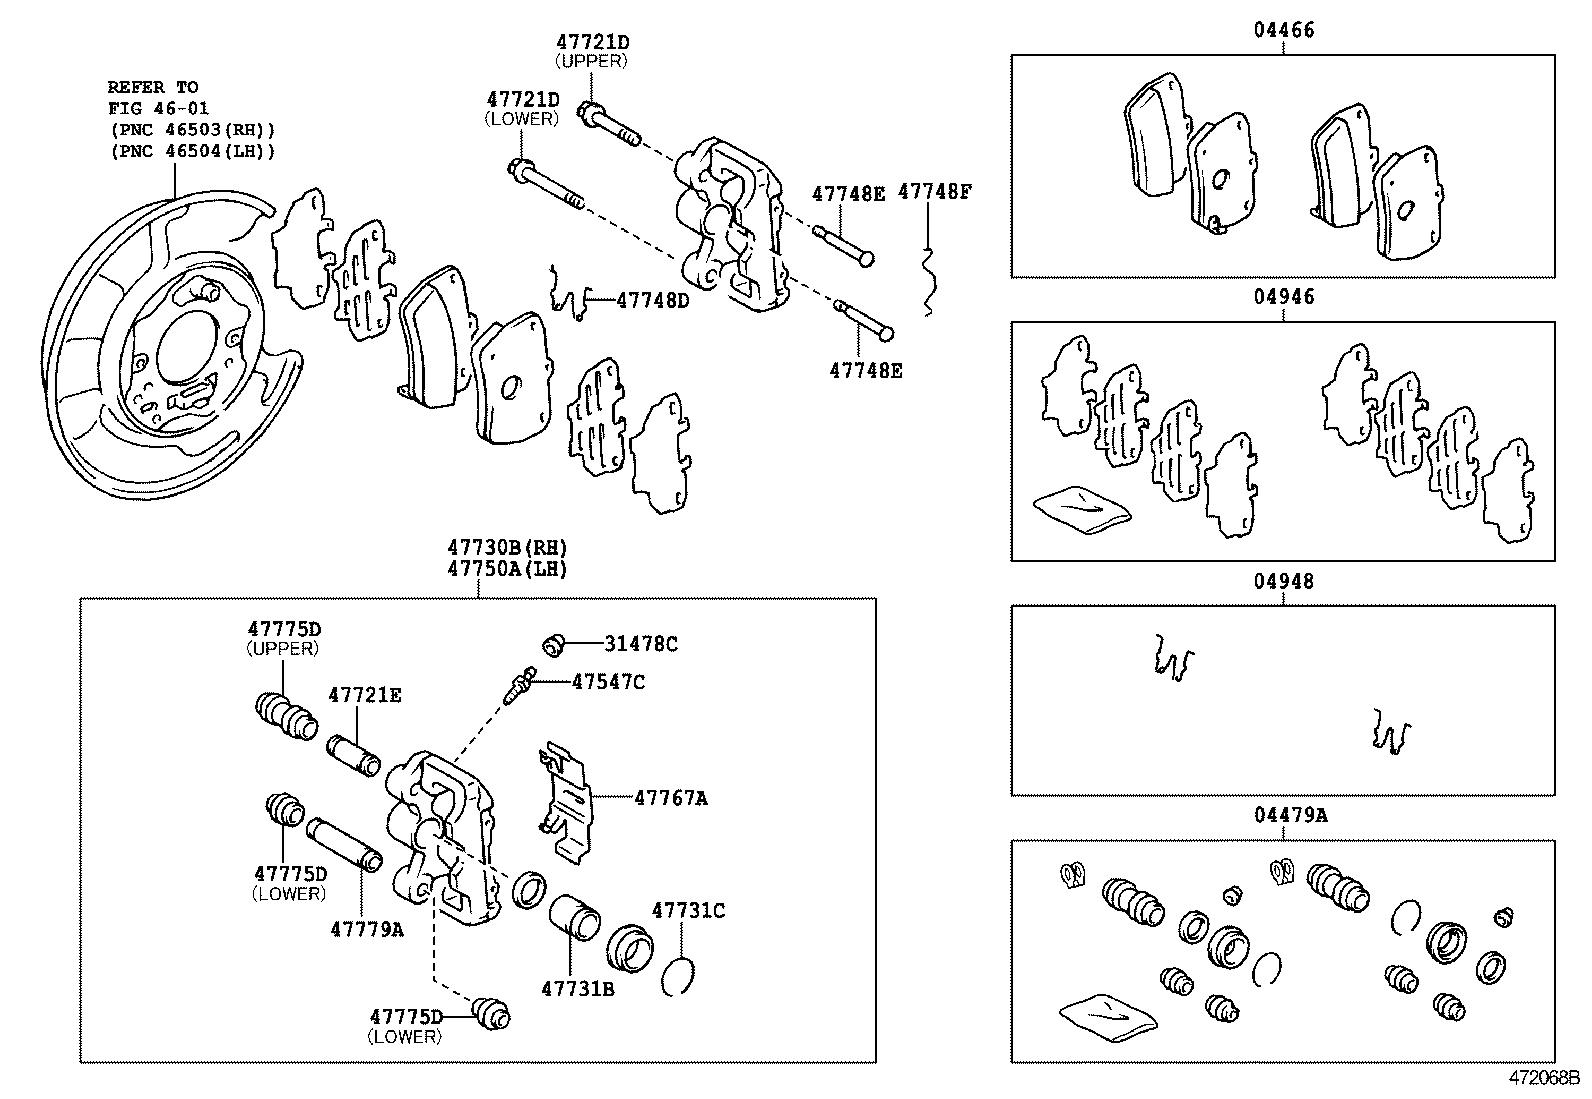 2003 toyota rav4 parts diagram front